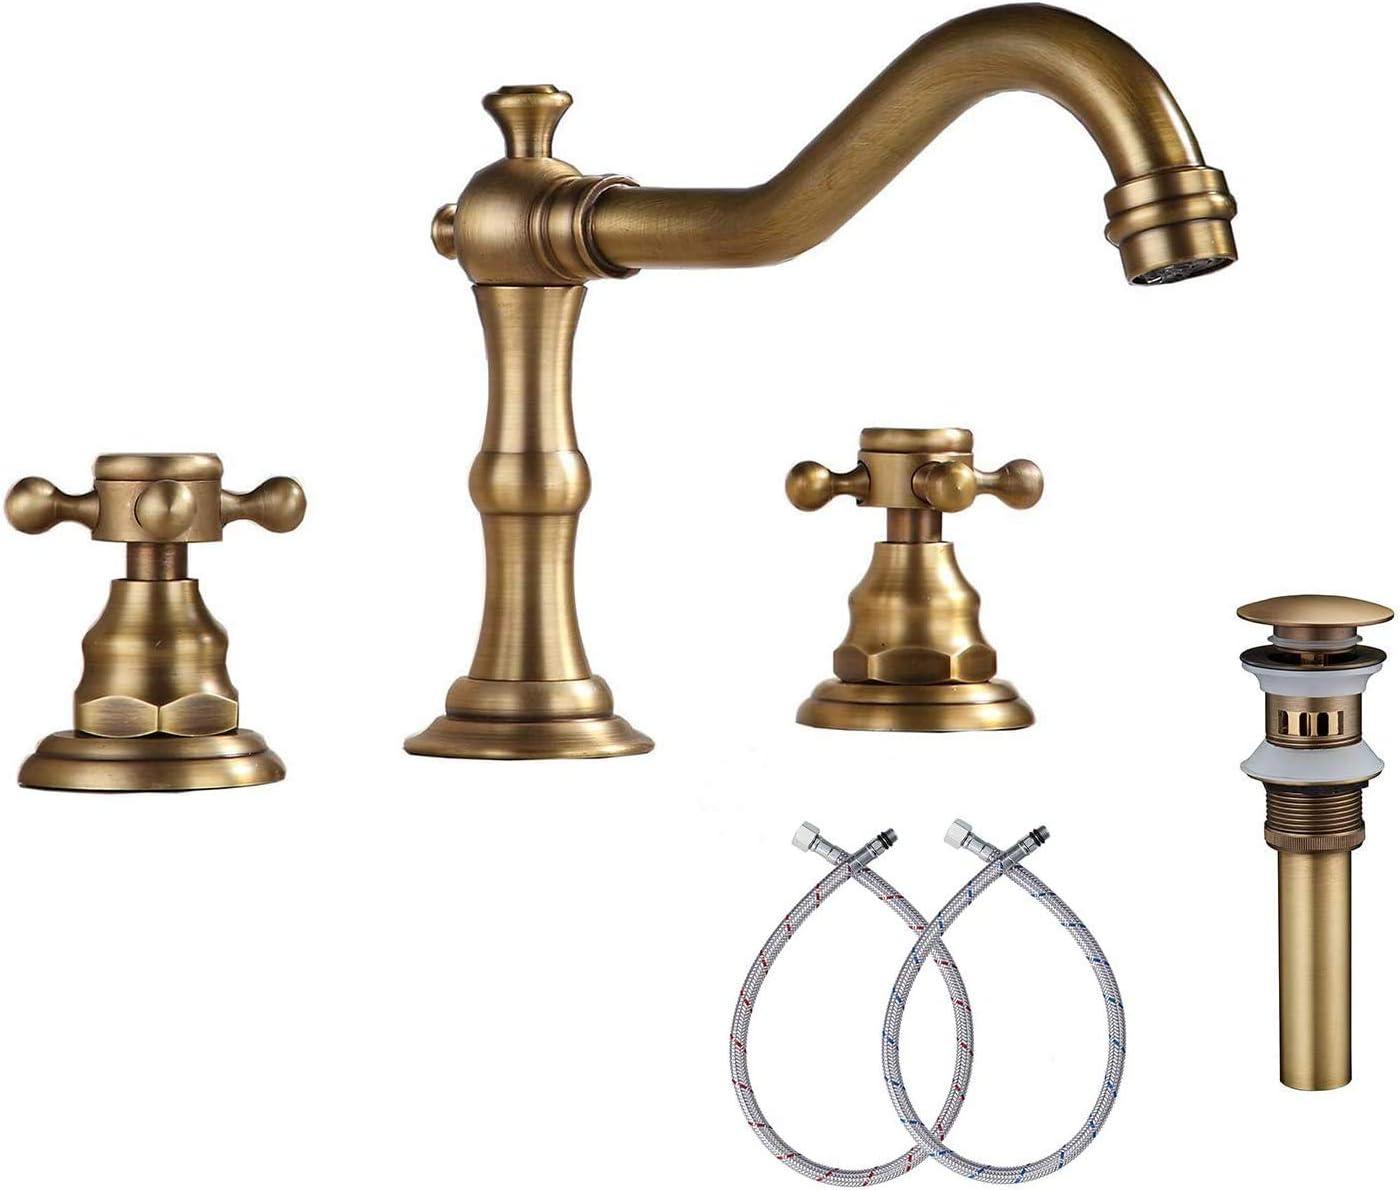 GGStudy Widespread Antique Brass Bathroom Sink Faucet